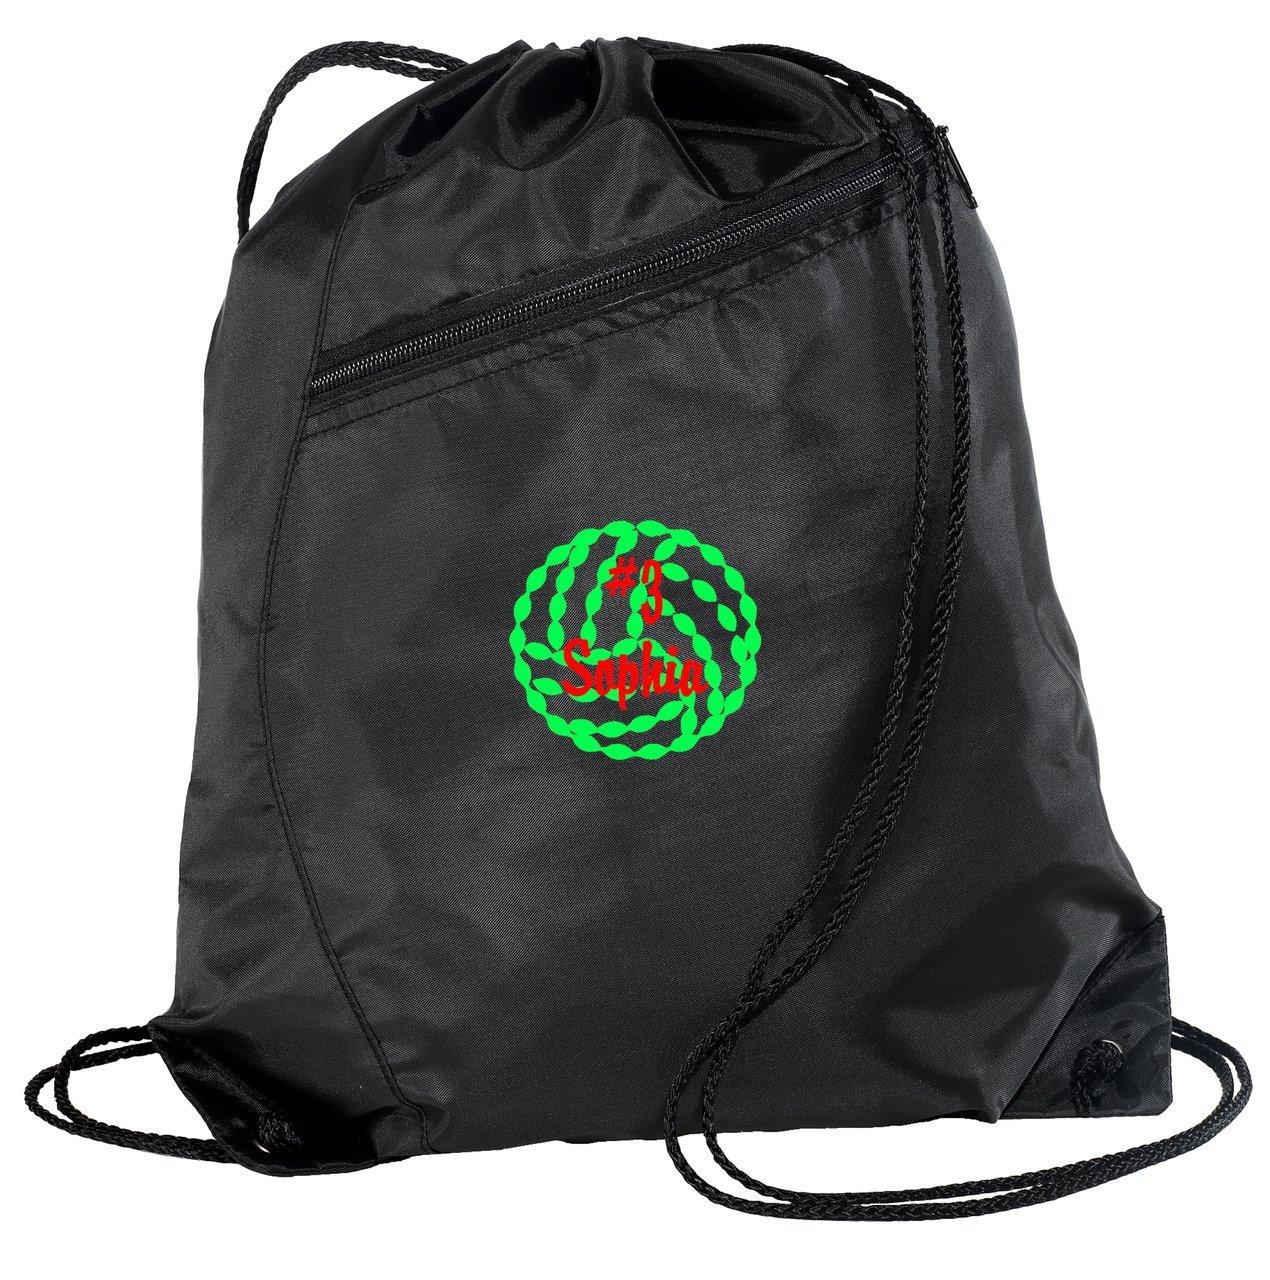 PersonalizedバレーボールDrawstringカラーブロックCinch Packバックパック B018KWY4D8 ブラック/ブラック ブラック/ブラック